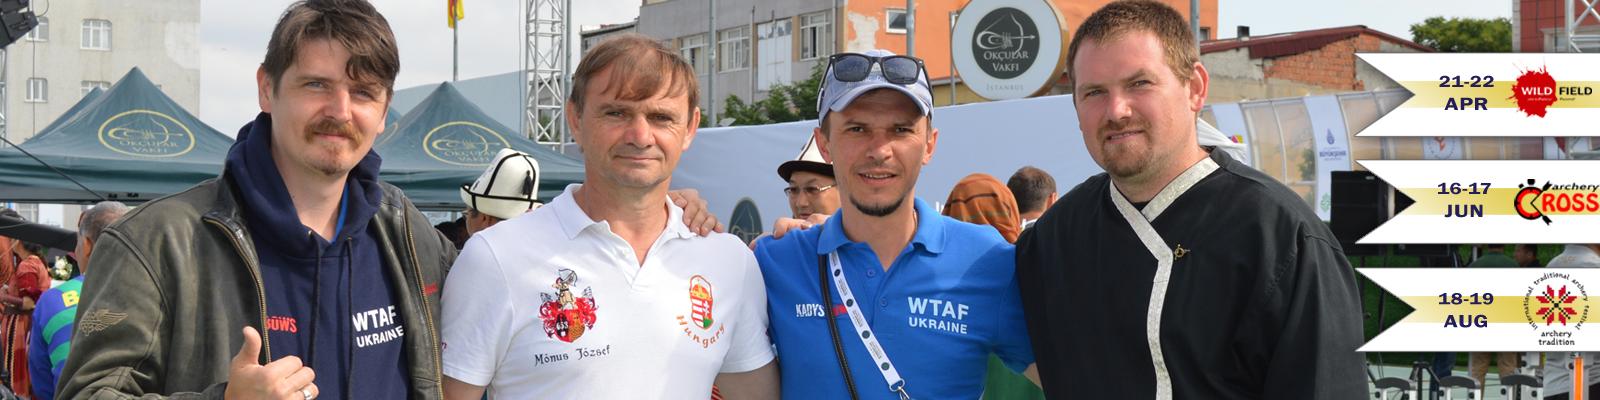 {:ru}WTAF Украина{:}{:en}WTAF Ukraine{:}{:uk}WTAF Україна{:}